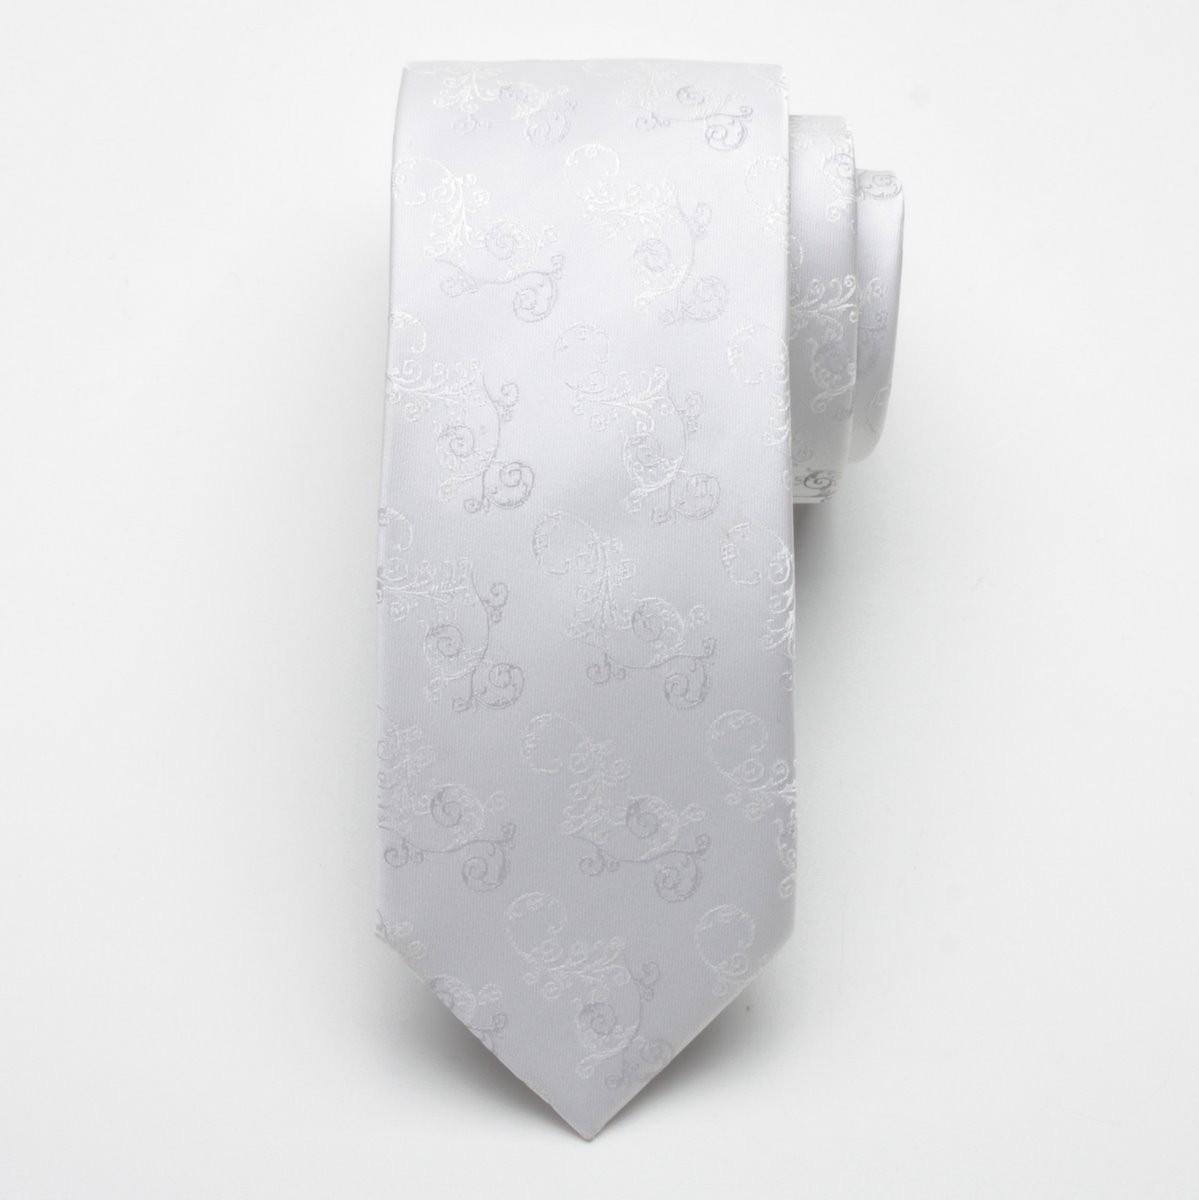 Krawat ślubny (wzór 8)